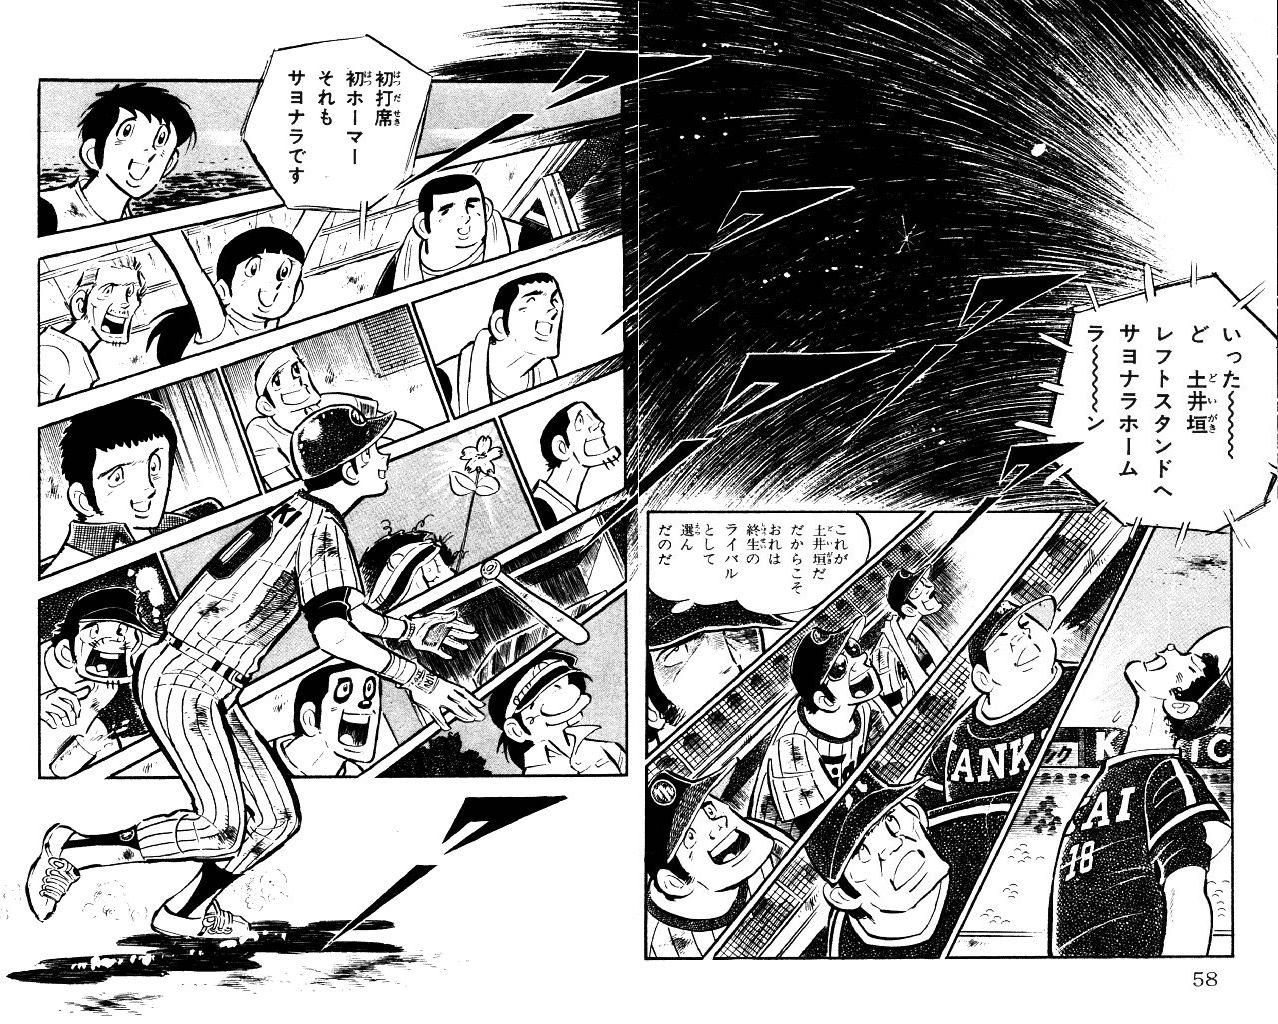 no title 速報の速報:【ドカベン】土井垣のプロ初HRの演出がカッコ良すぎる件 速報の速報